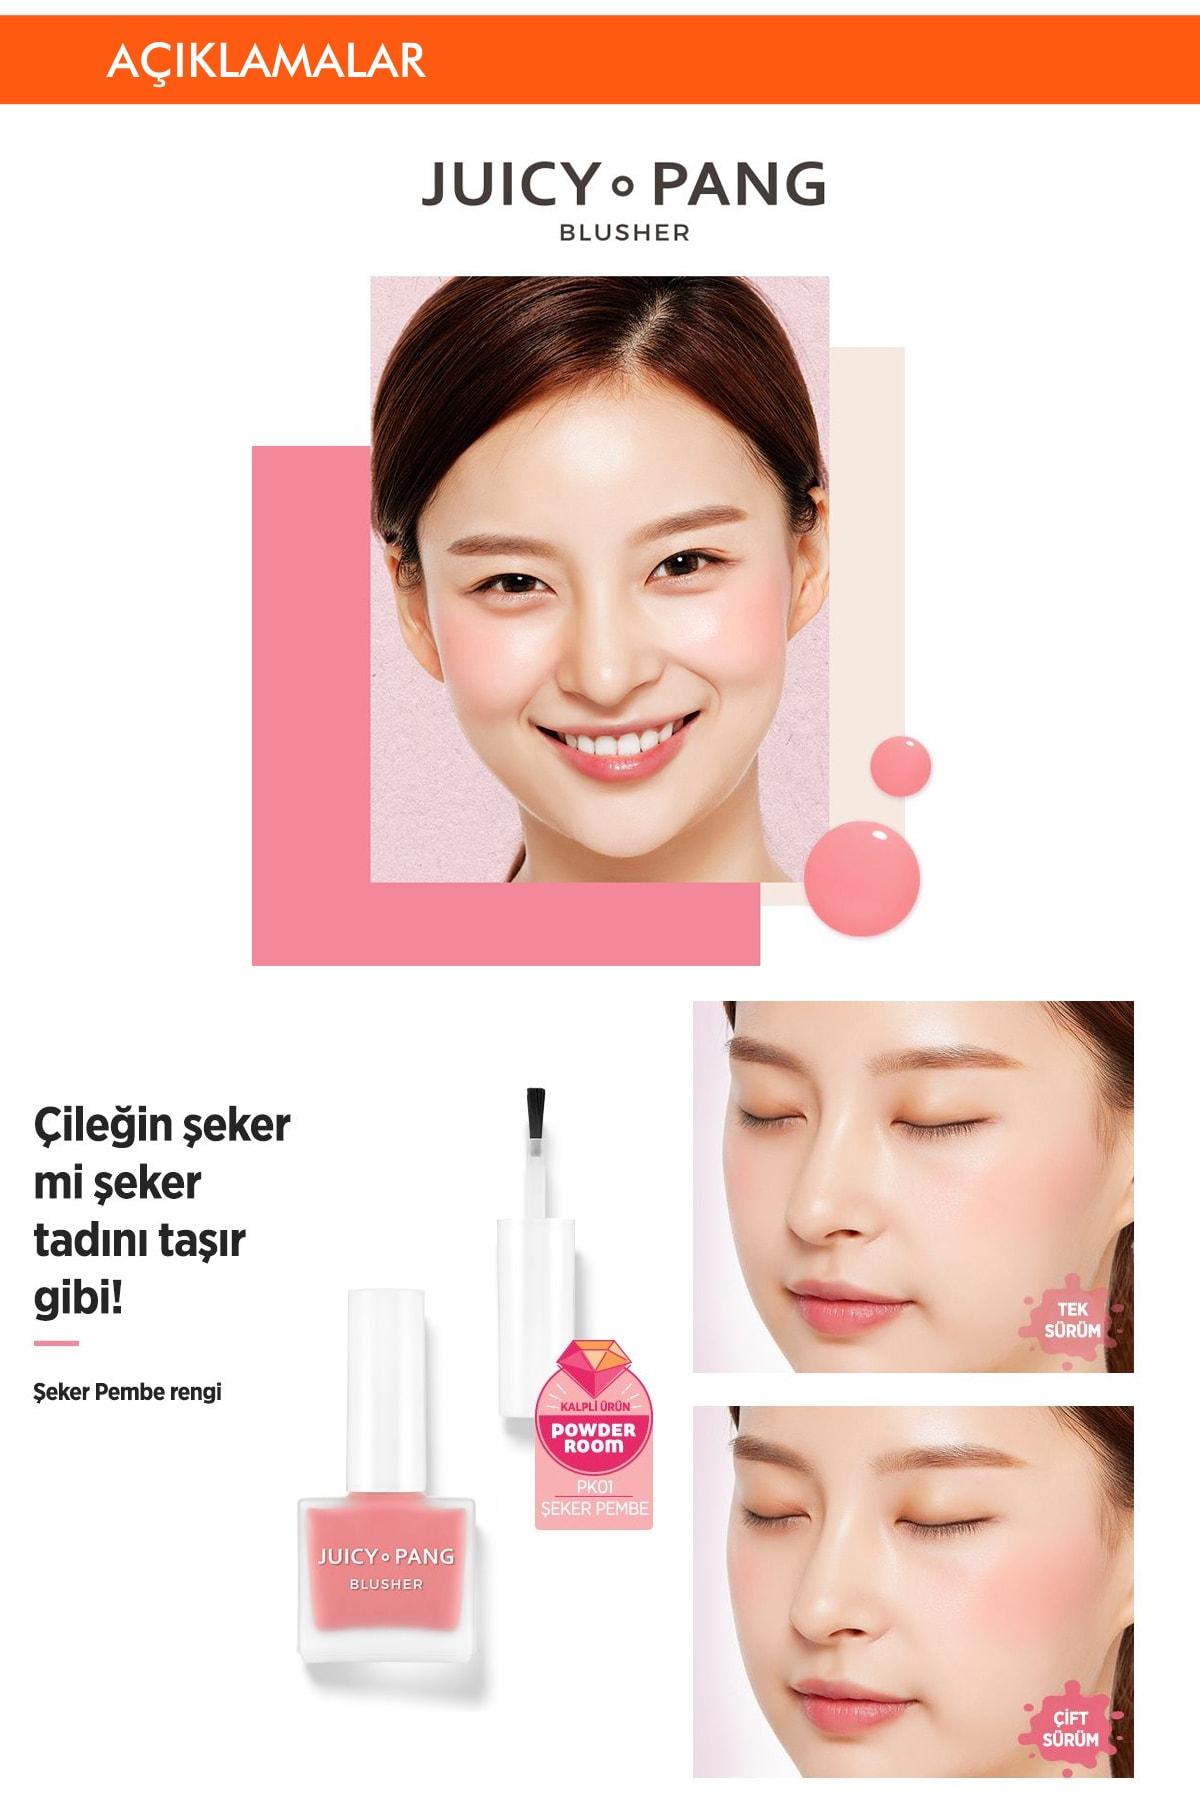 Missha Doğal Görünüm Sunan Nemlendirici Likit Allık 9g. APIEU Juicy-Pang Water Blusher (PK01) 2